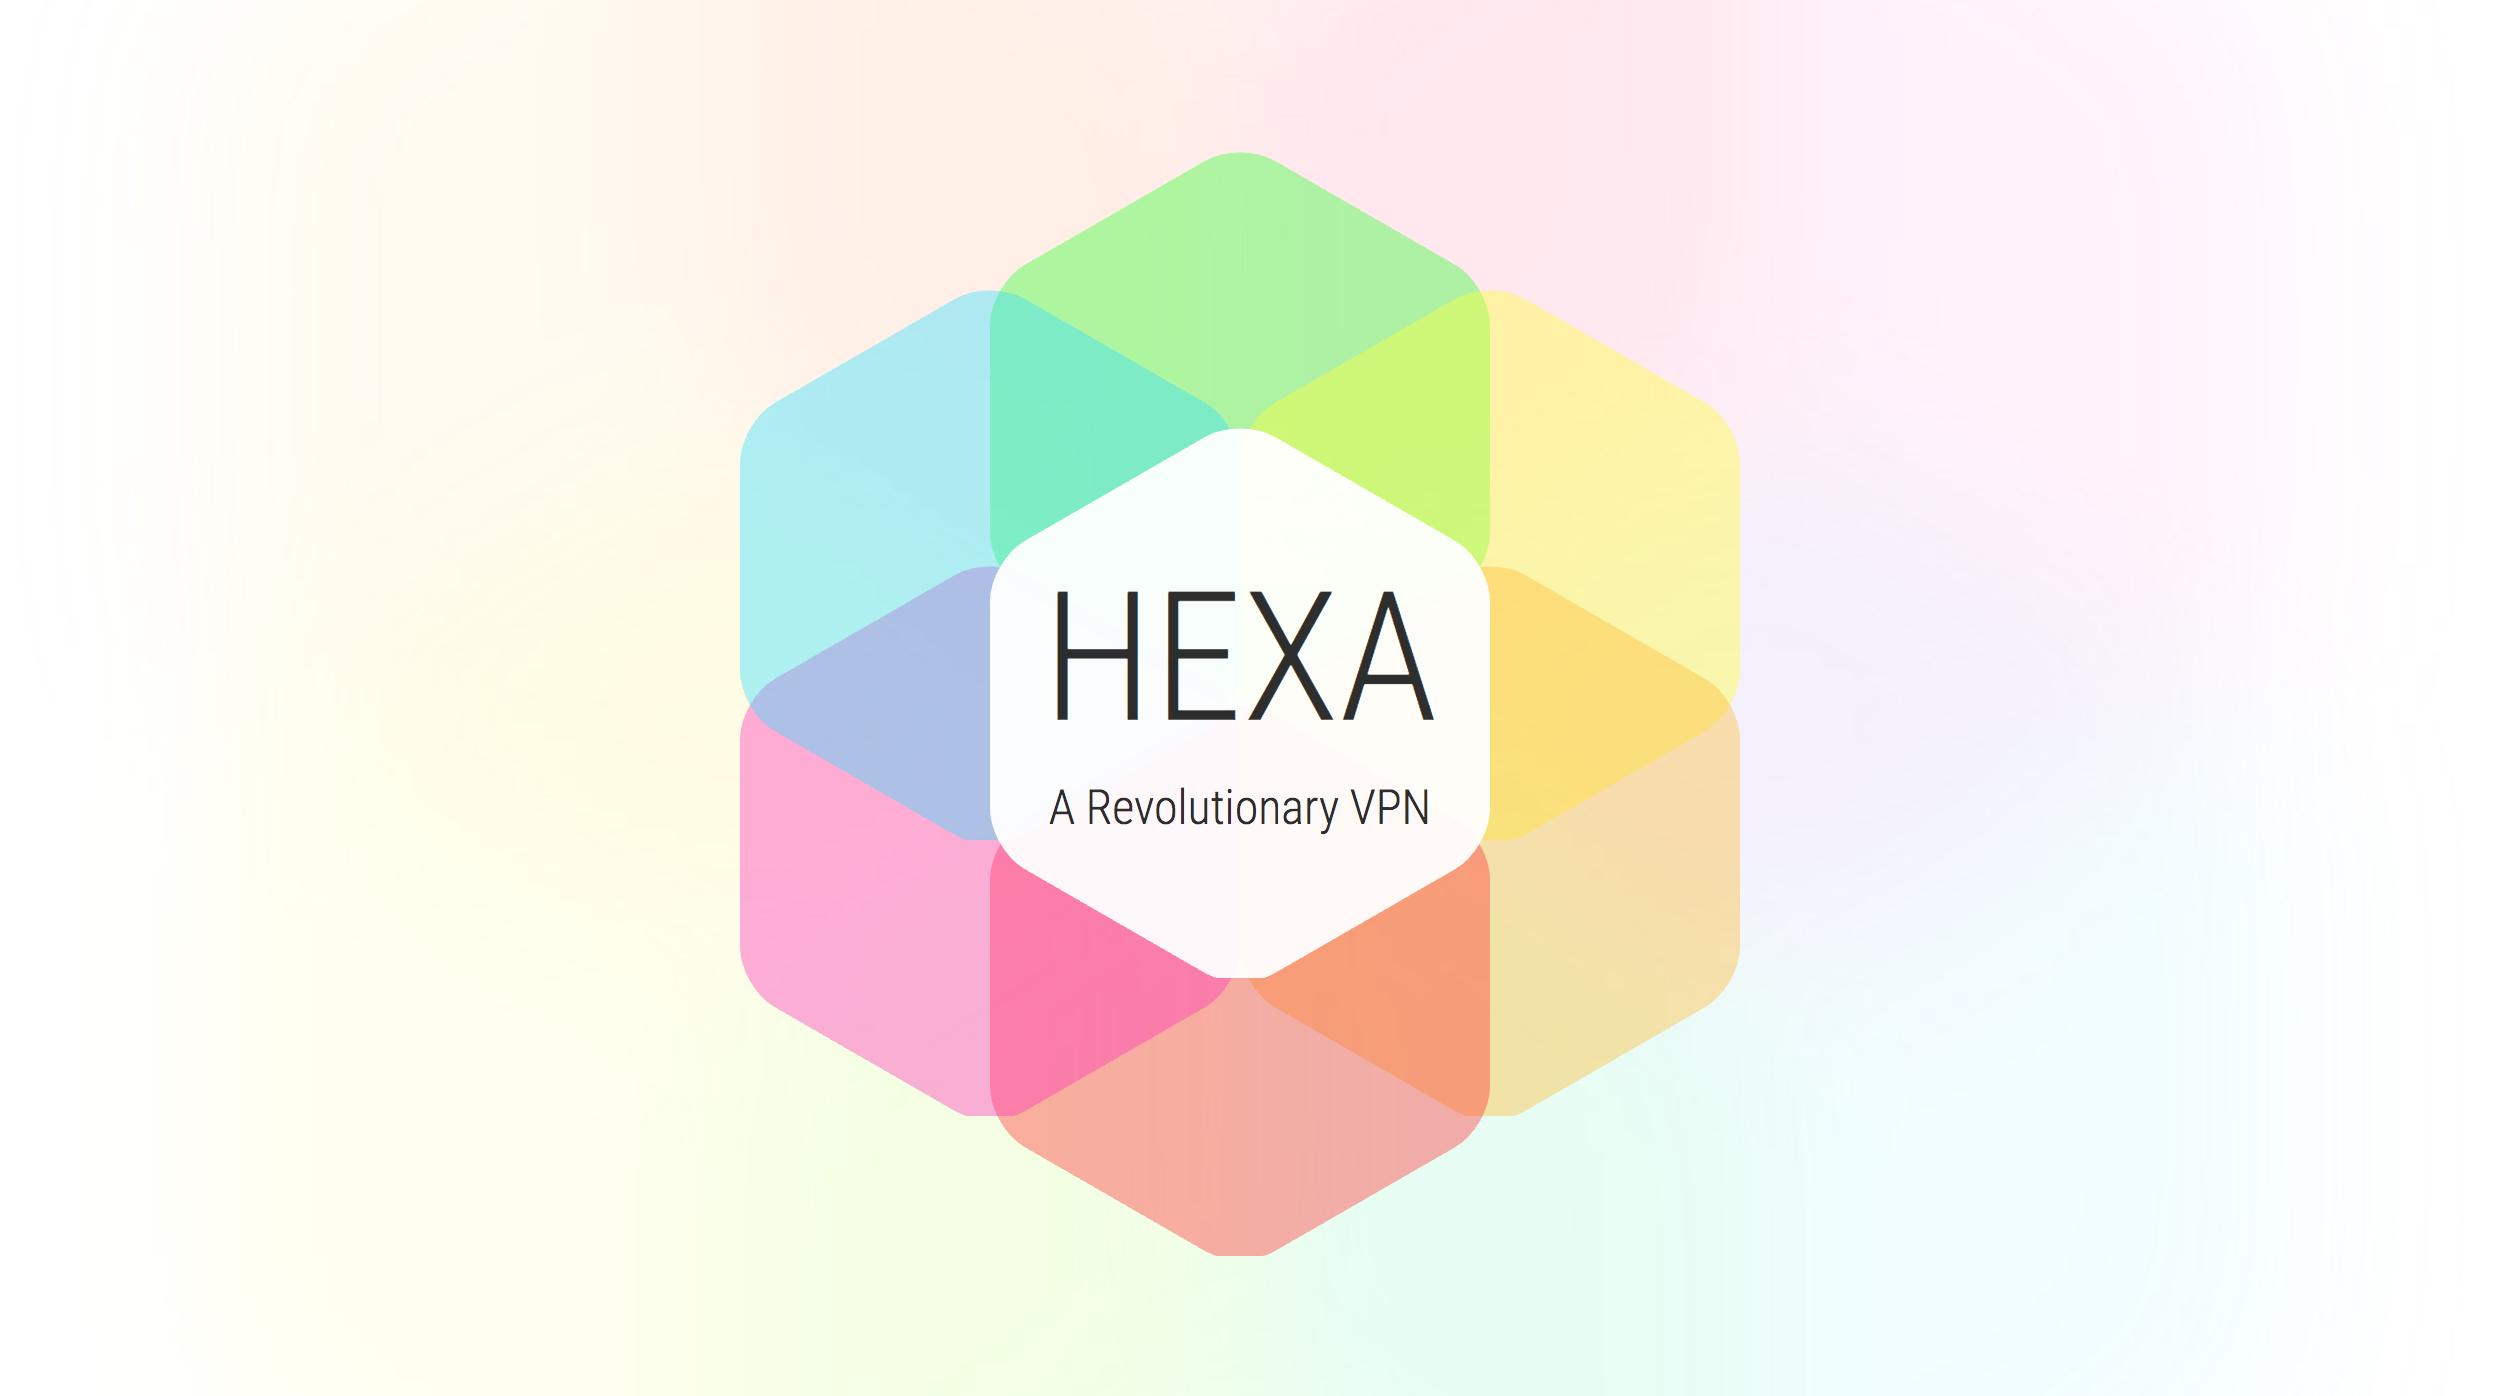 Photo Credit: Hexatech